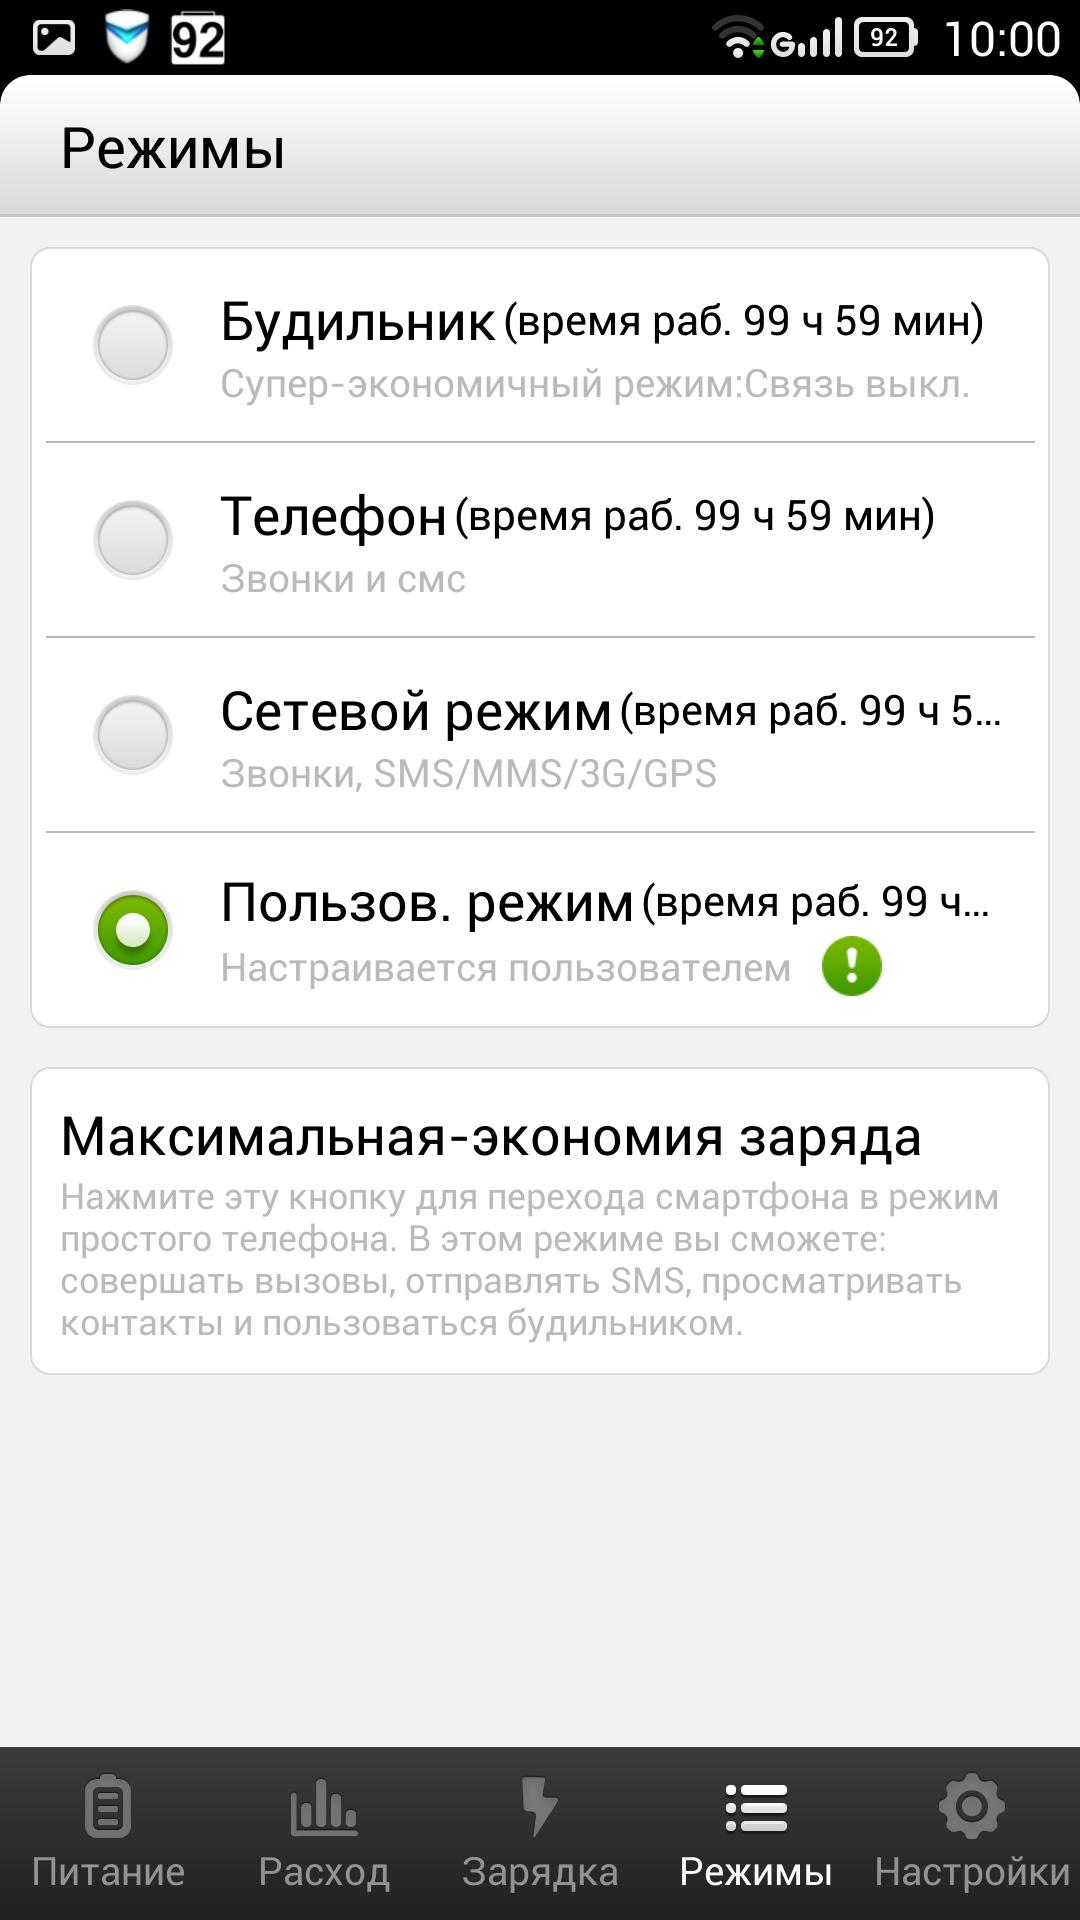 Screenshot_2014-05-20-10-00-35